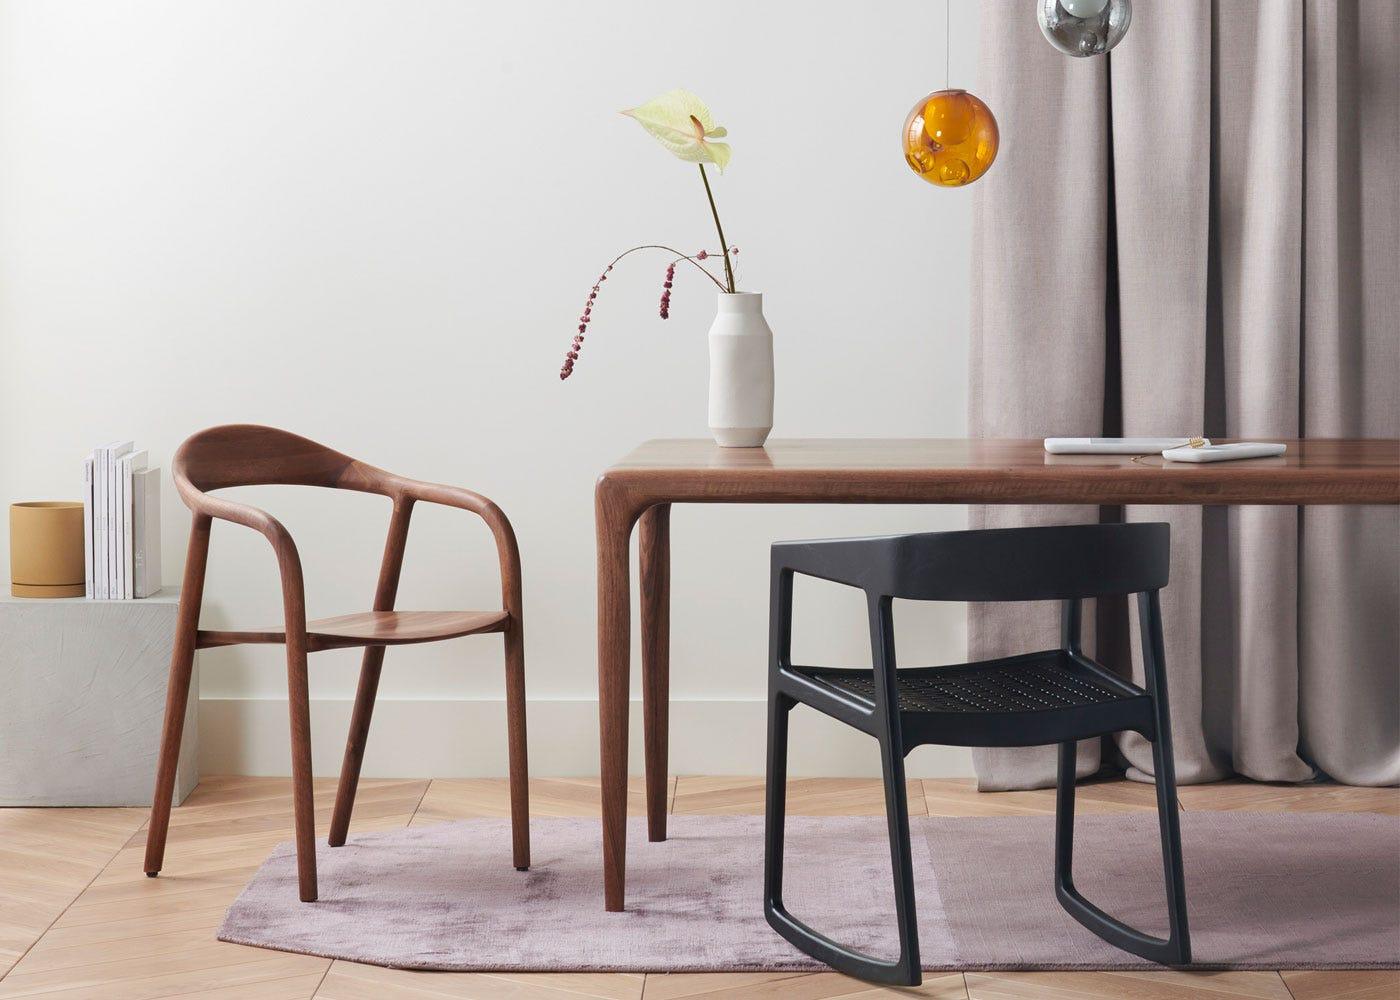 As Shown: Latus dining table, Neva armchair - both in walnut finish.